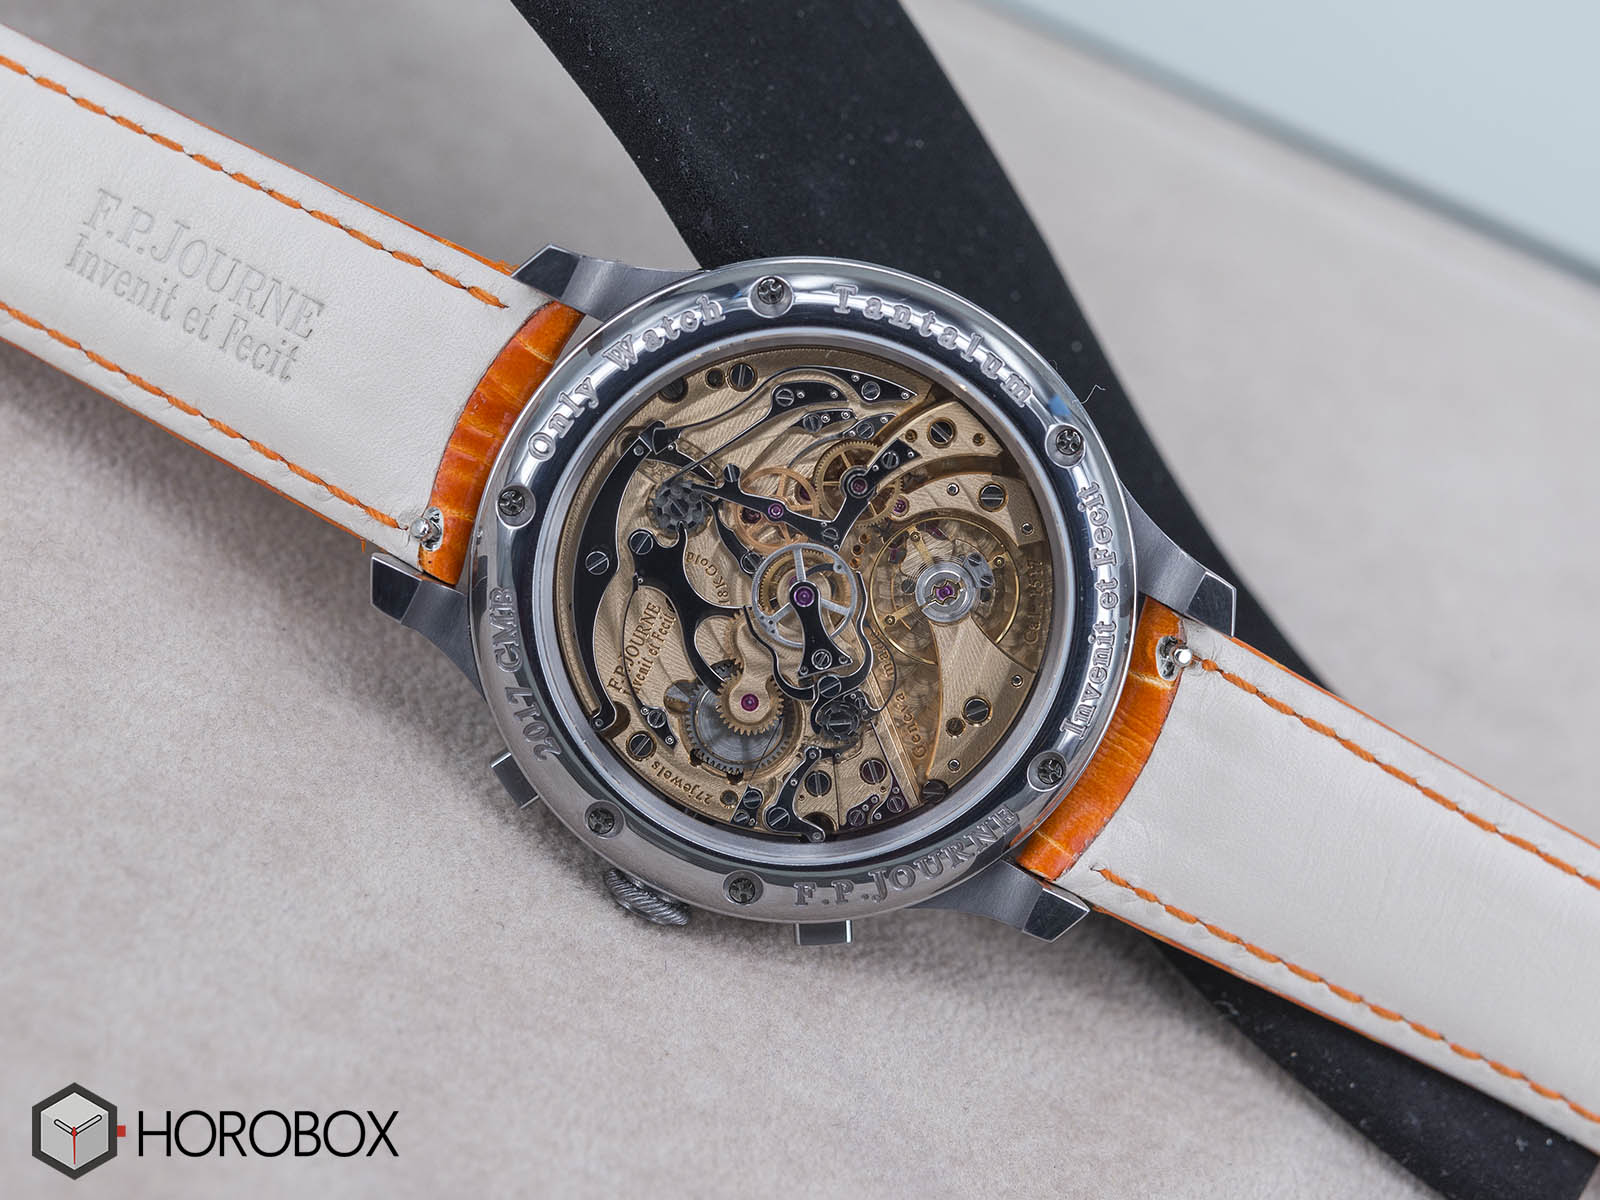 f-p-journe-chronographe-monopoussoir-rattrapante-bleu-2.jpg